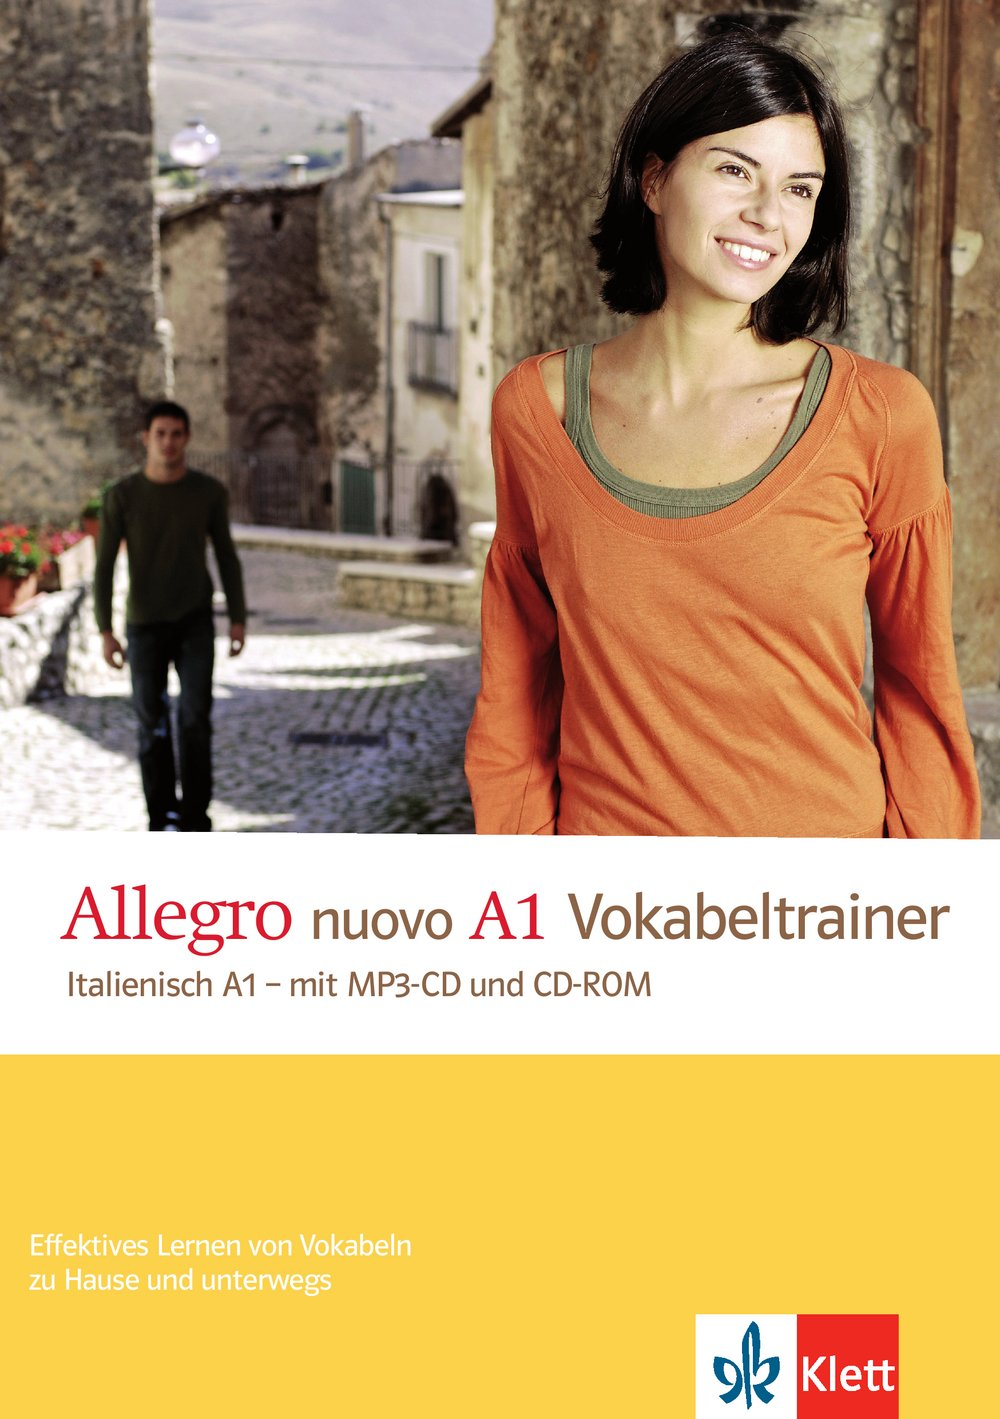 Allegro nuovo A1 Vokabeltrainer: Vokabelheft + MP3-CD + CD-ROM